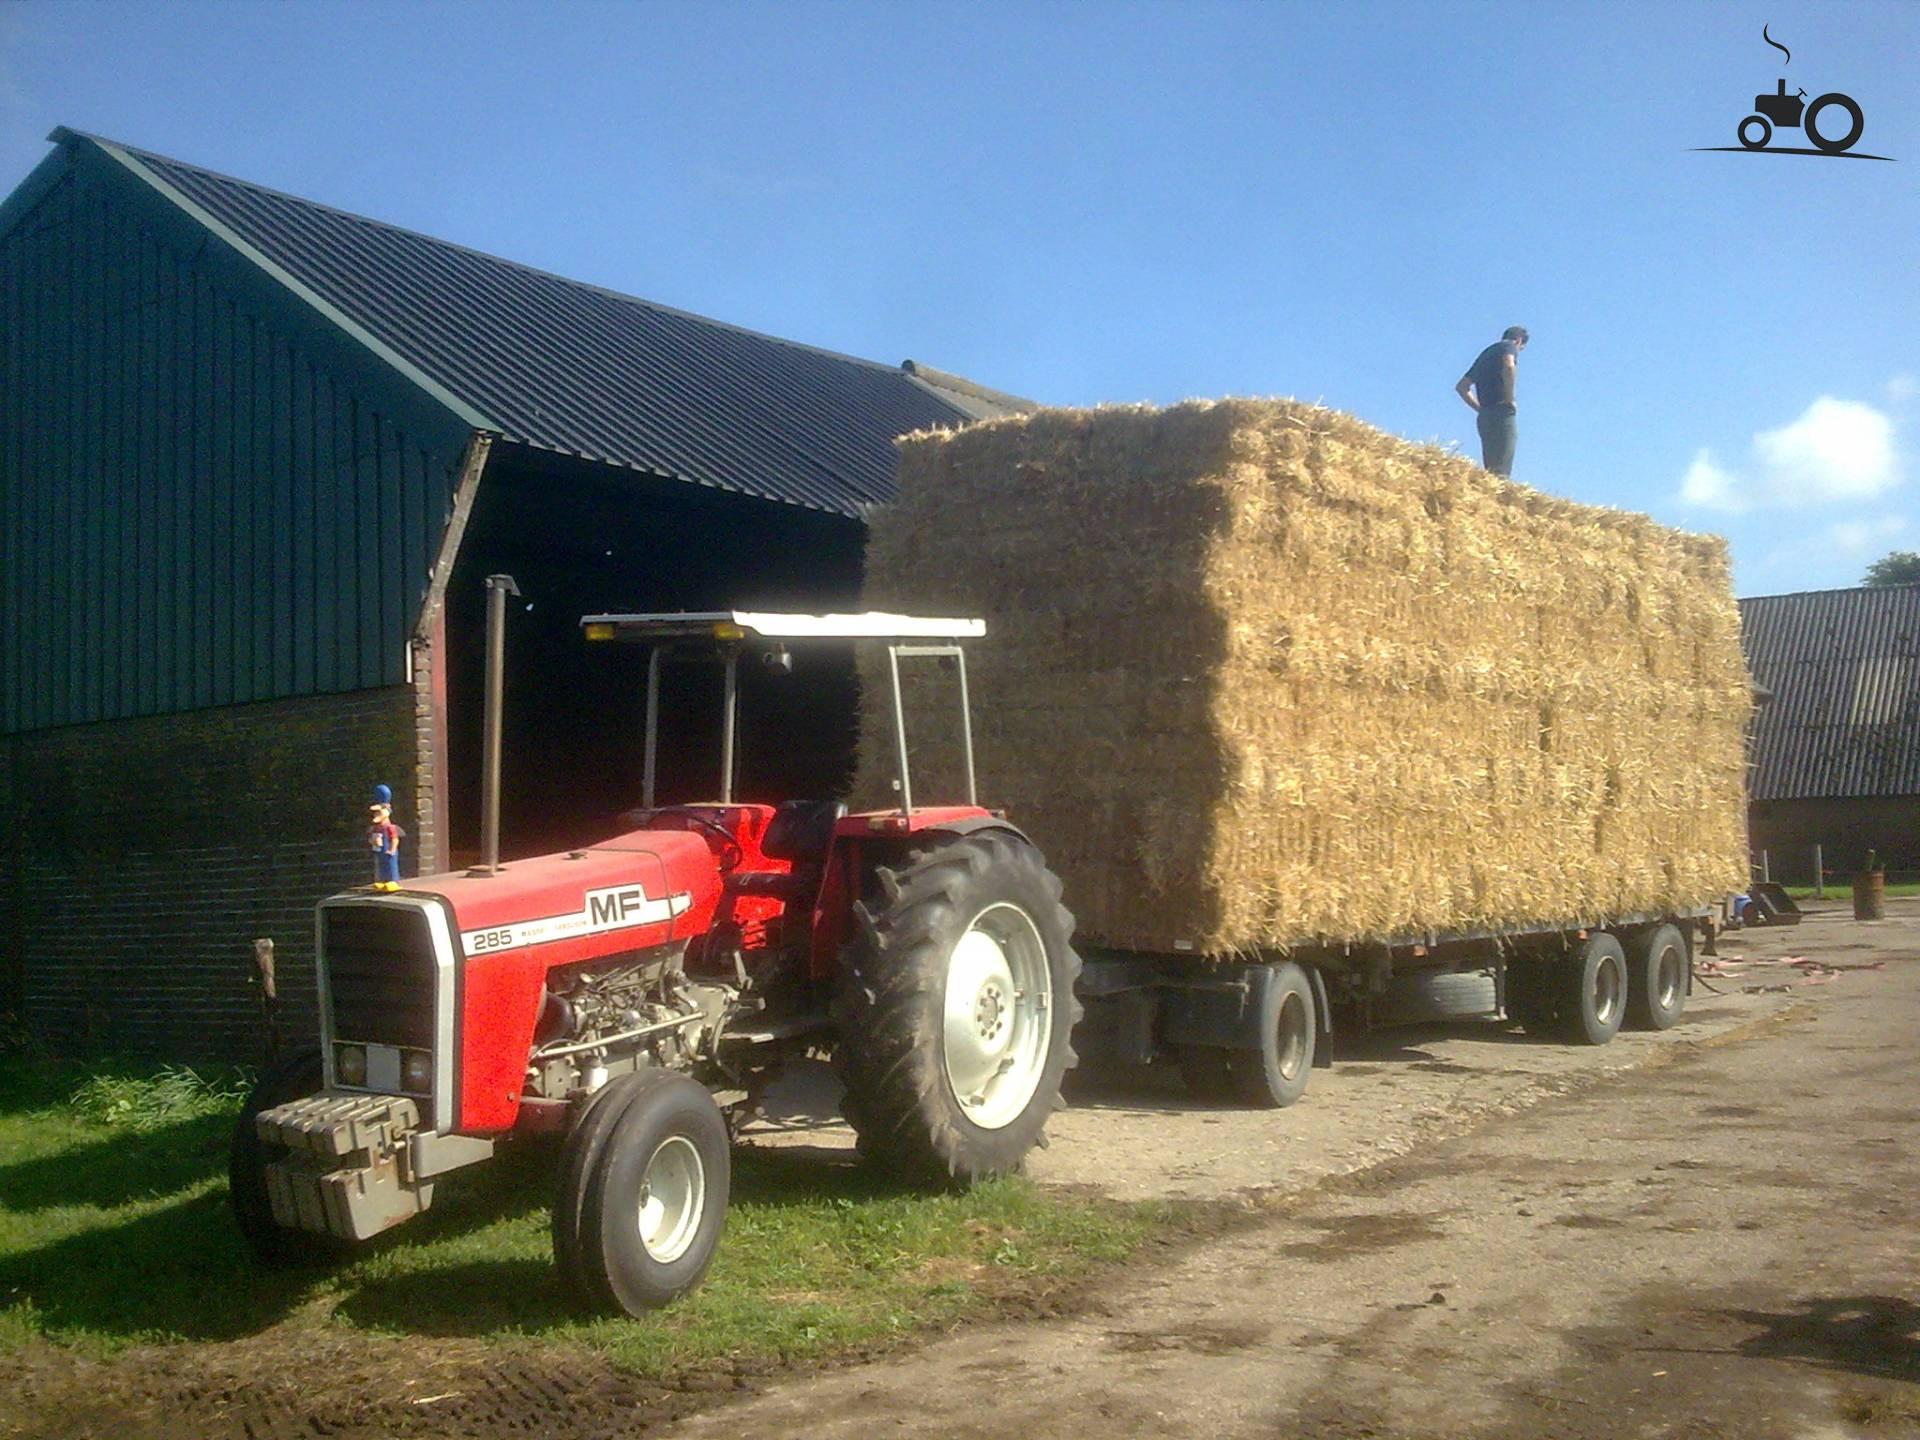 Massey Ferguson 285 Tractor Information : Massey ferguson g